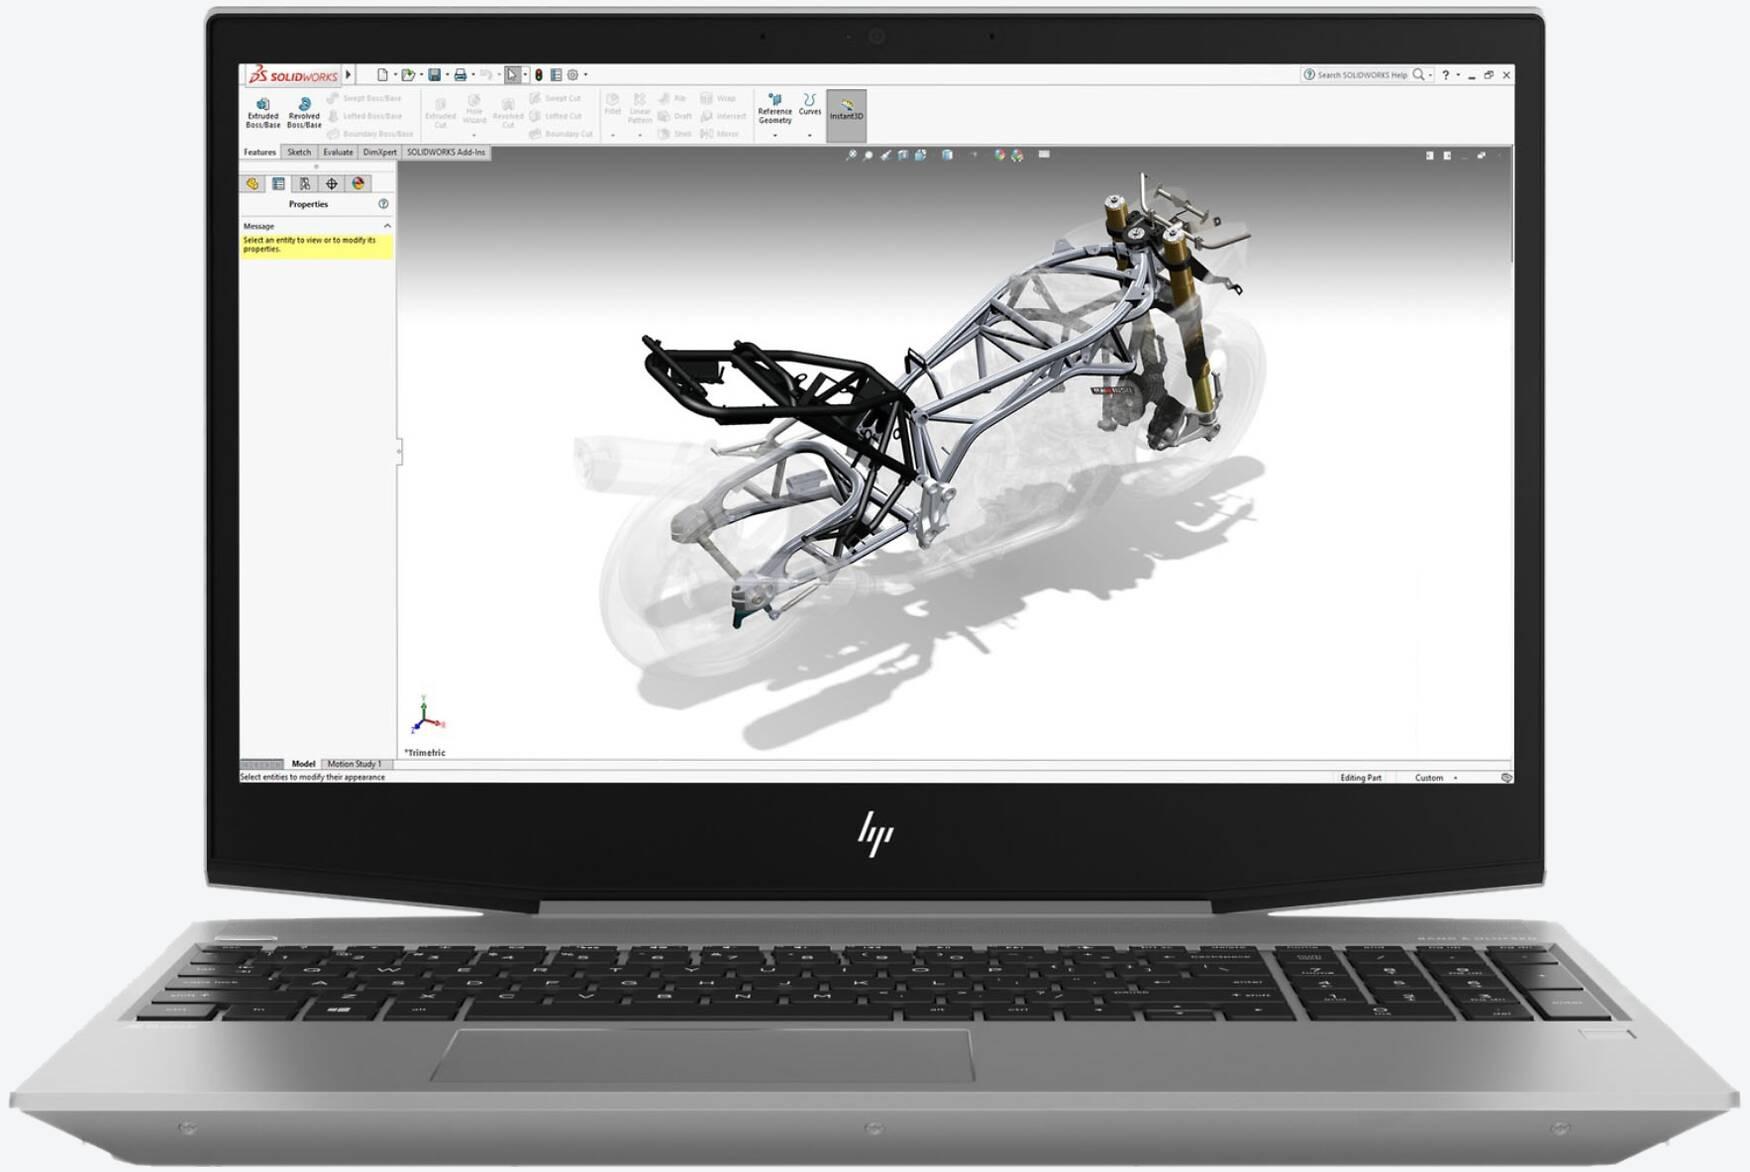 HP ZBook 15v G5 (4QH80EA)